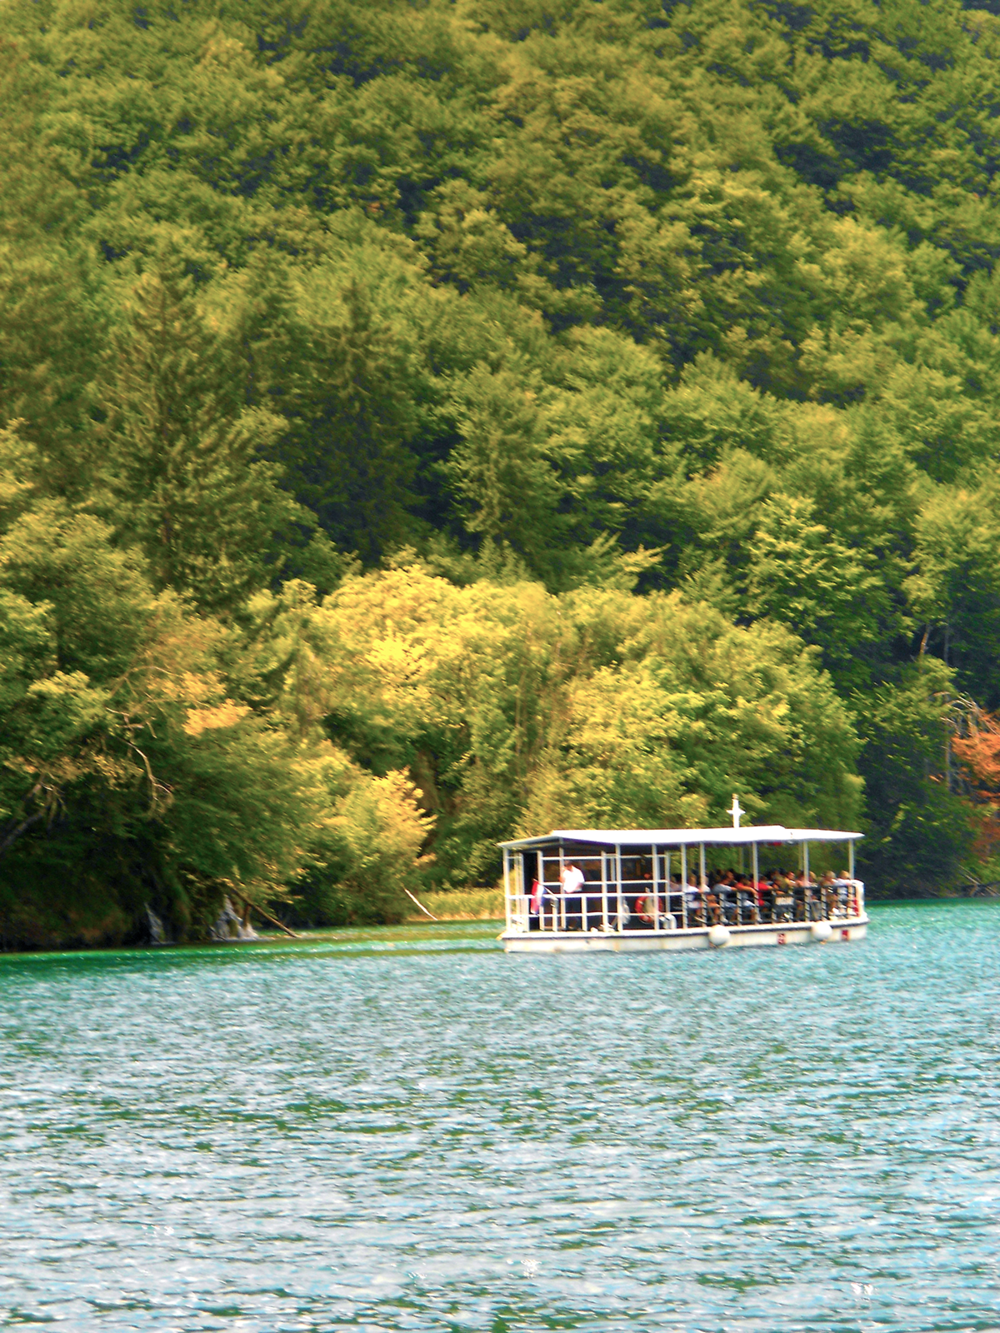 Plitvice Lakes National Parks Croatia boat on lake.png